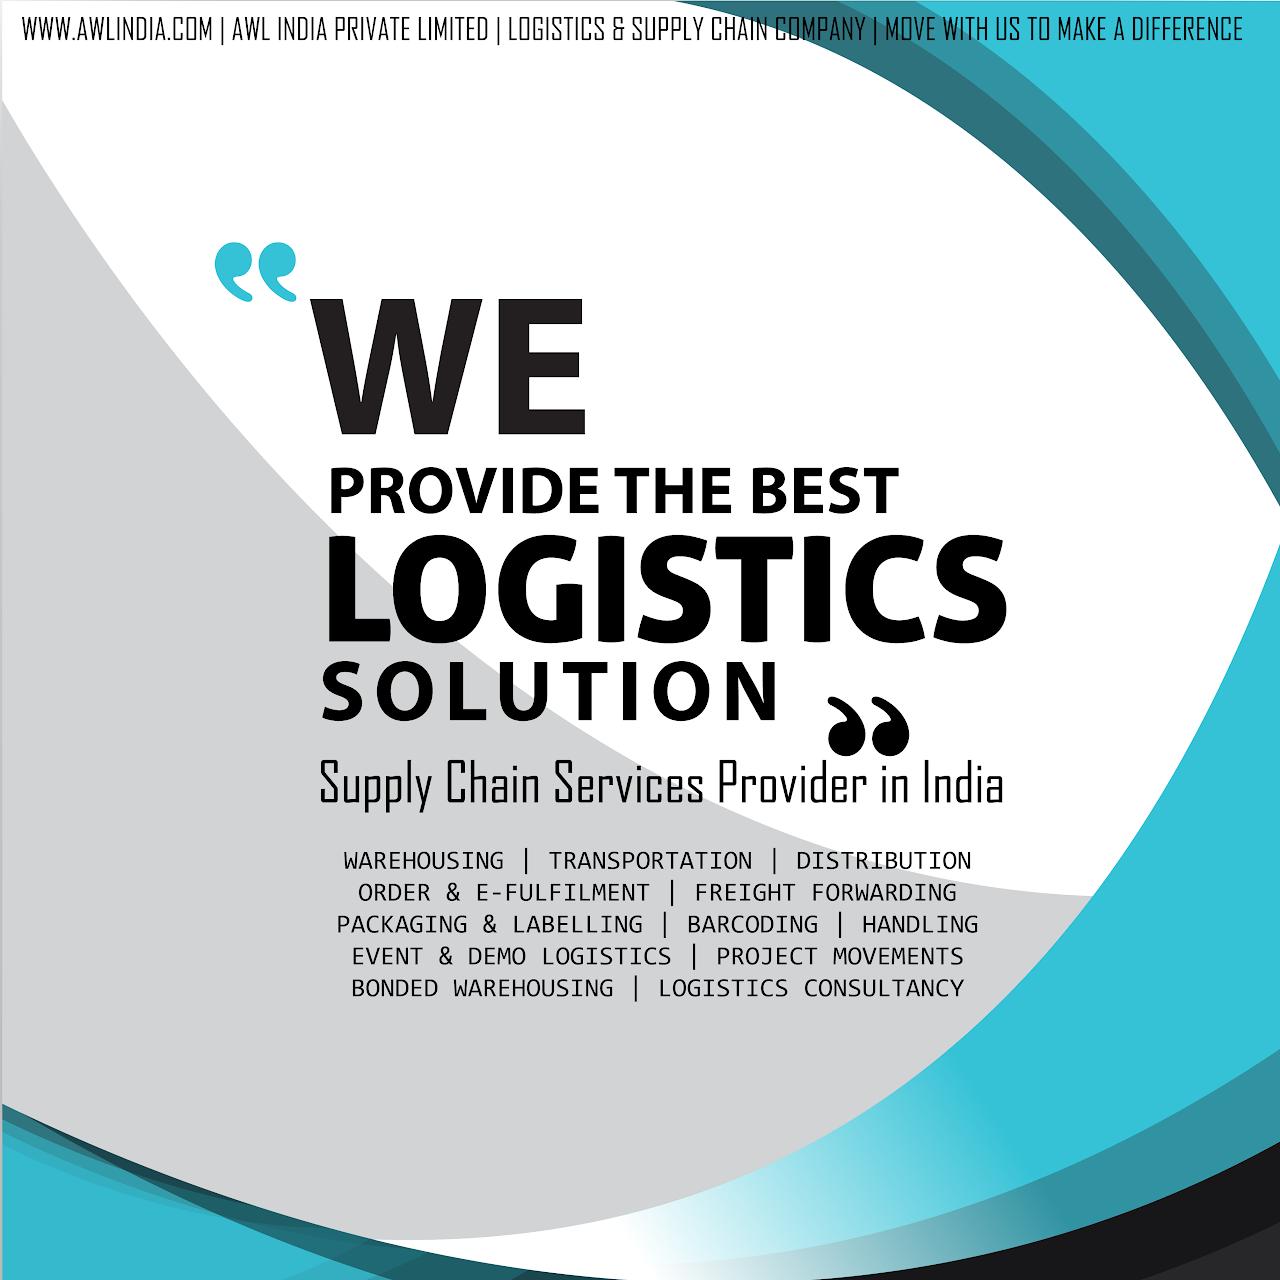 AWL India Pvt Ltd - Mumbai - Warehouse & Transportation in